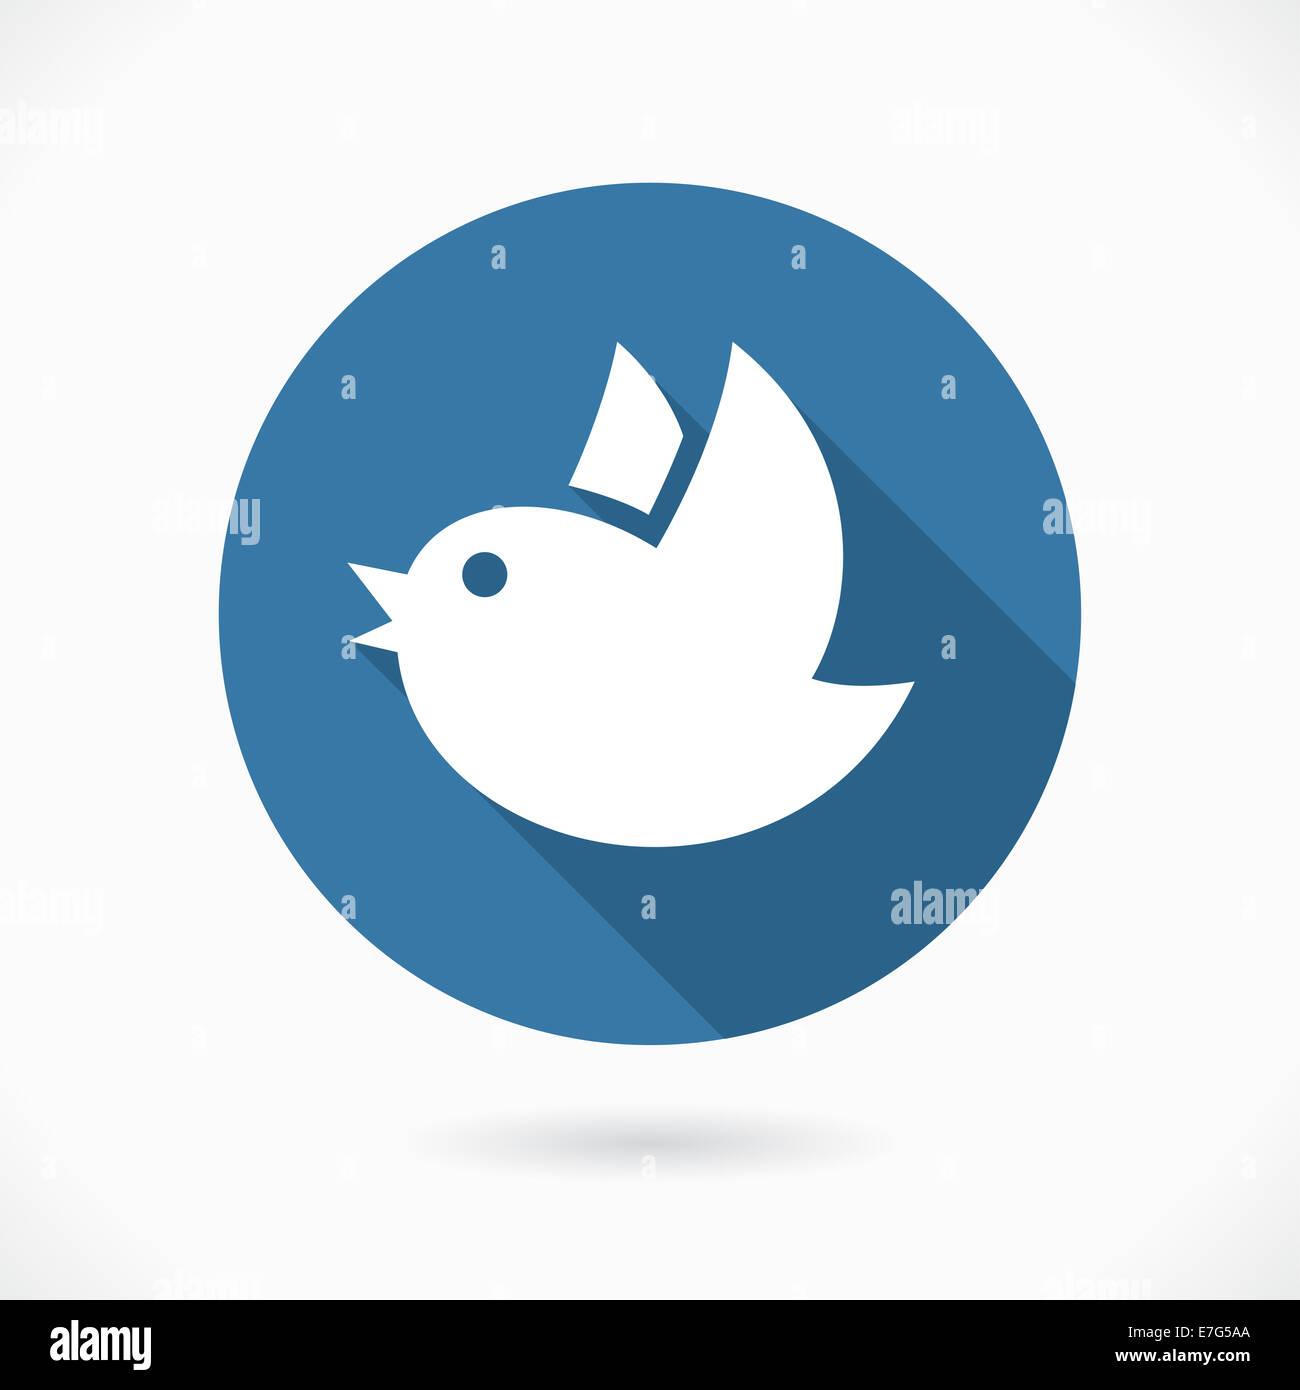 Round Blue Flying Bird Symbol Over Gray Background Stock Photo